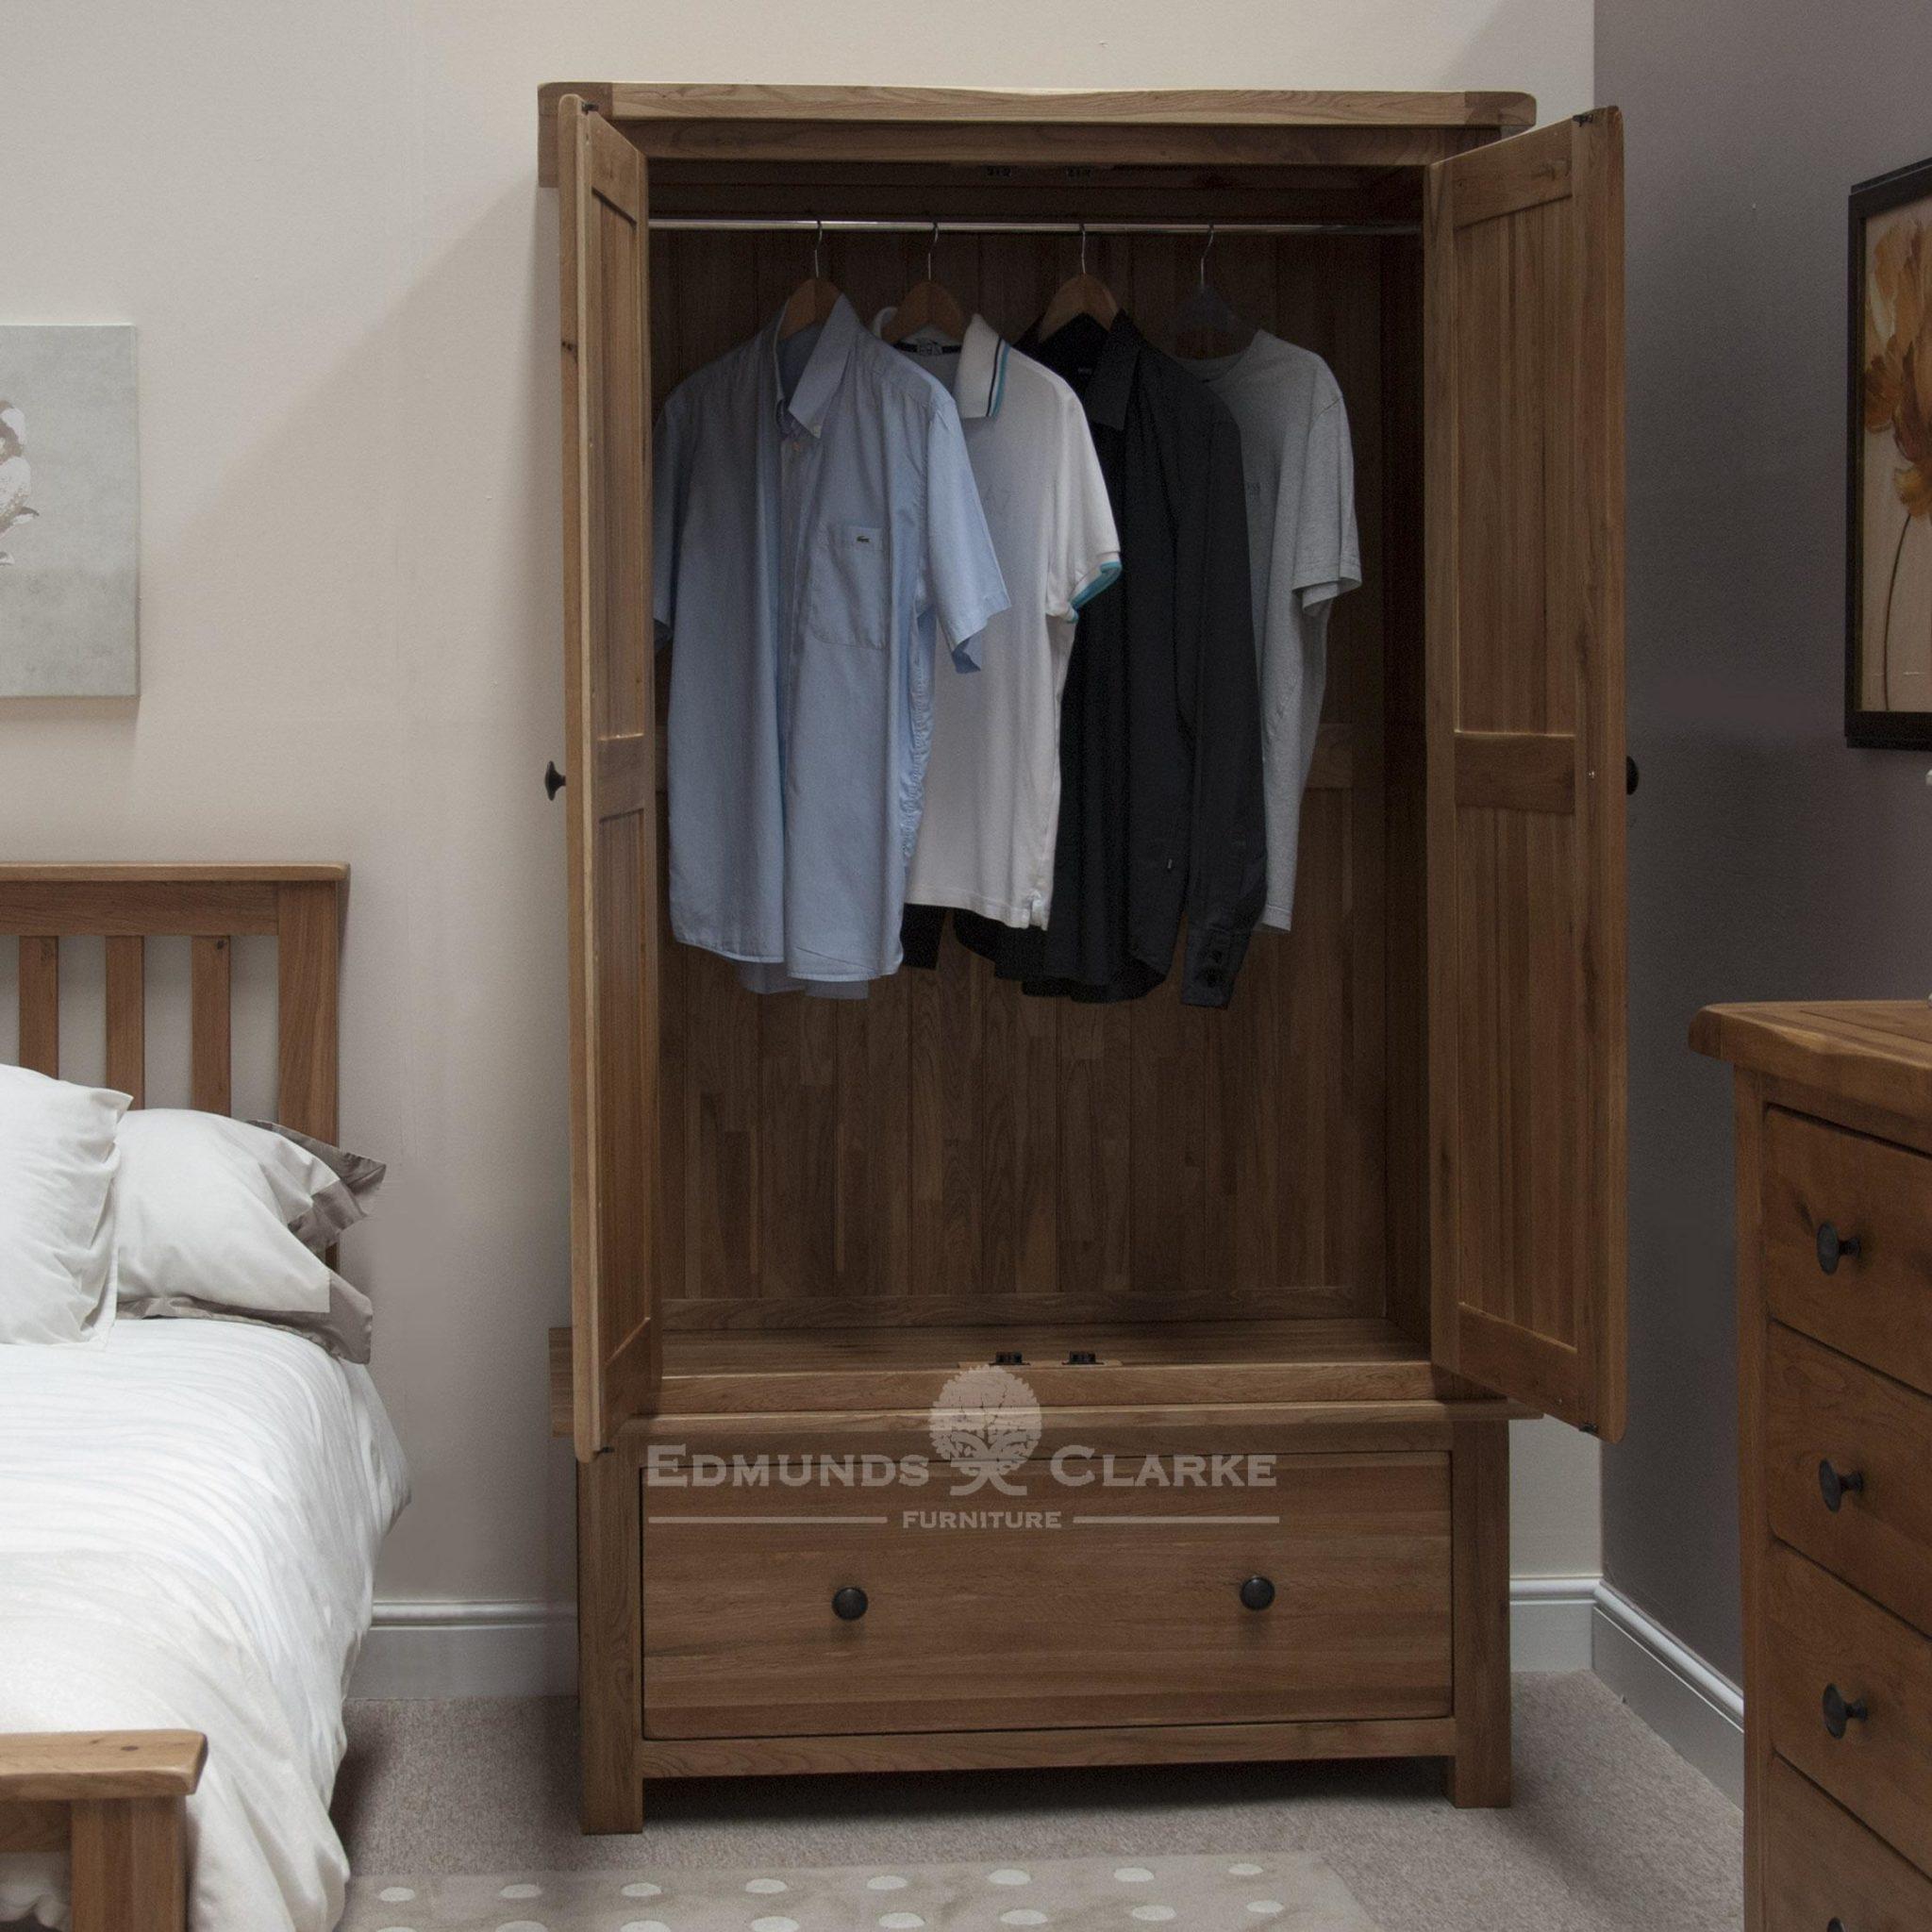 Lavenham rustic oak wardrobe with two doors and large deep drawer below